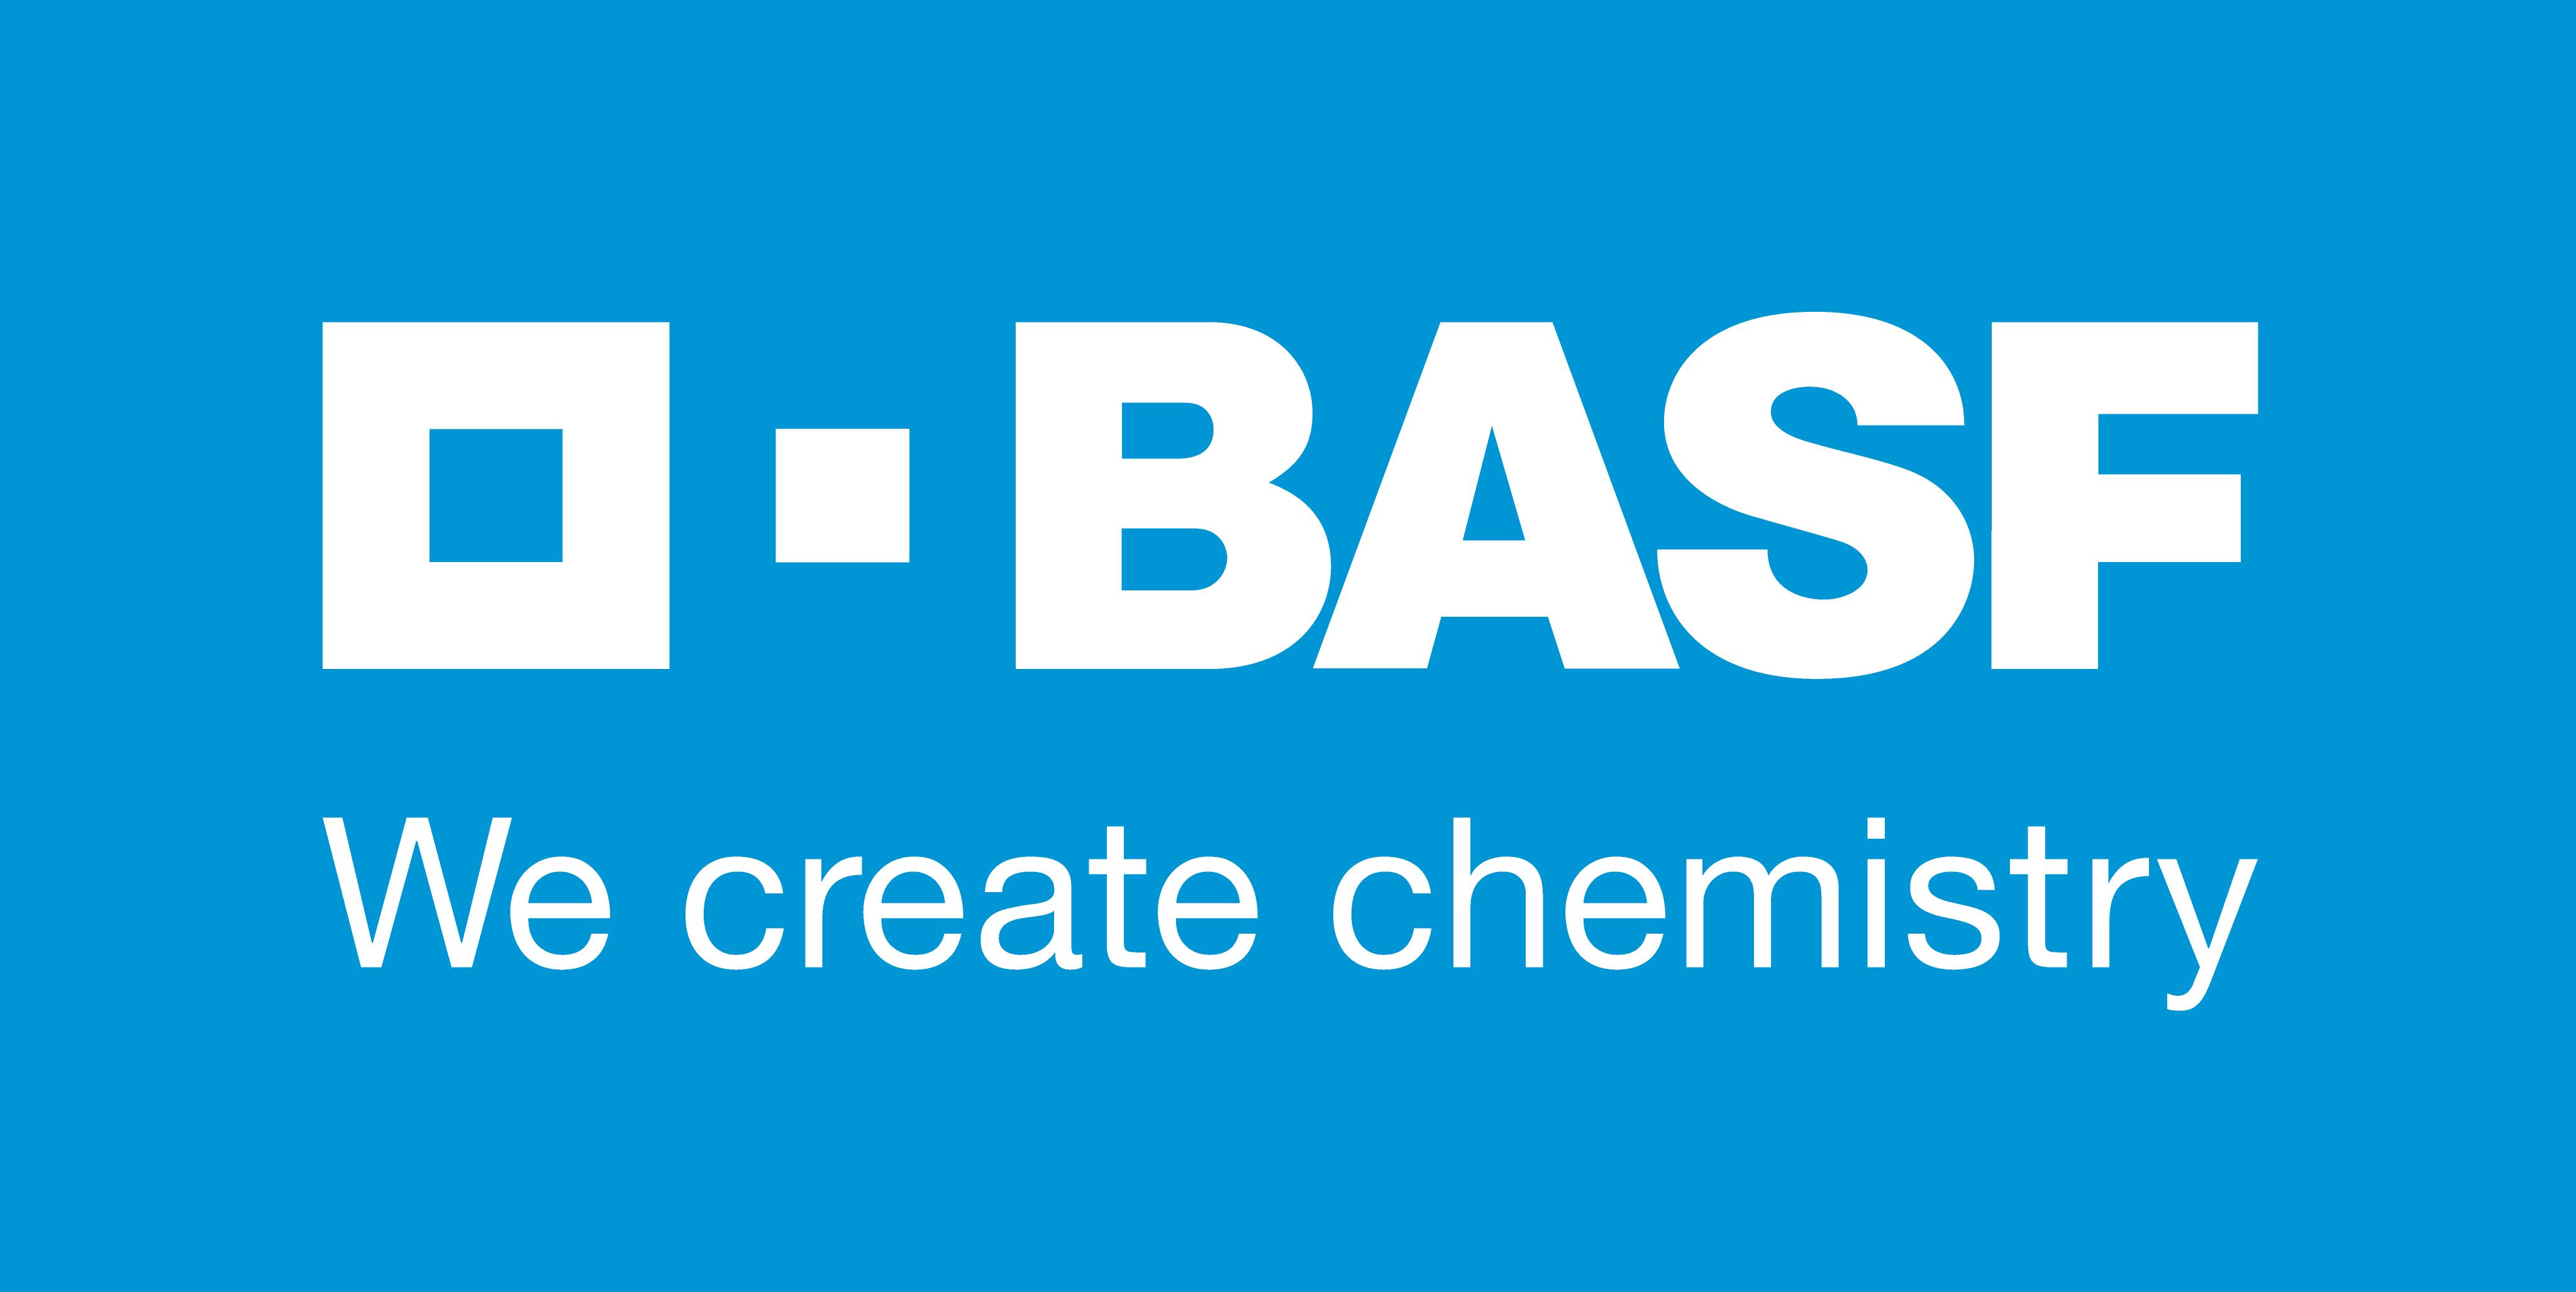 basf logo 8 - BASF Logo